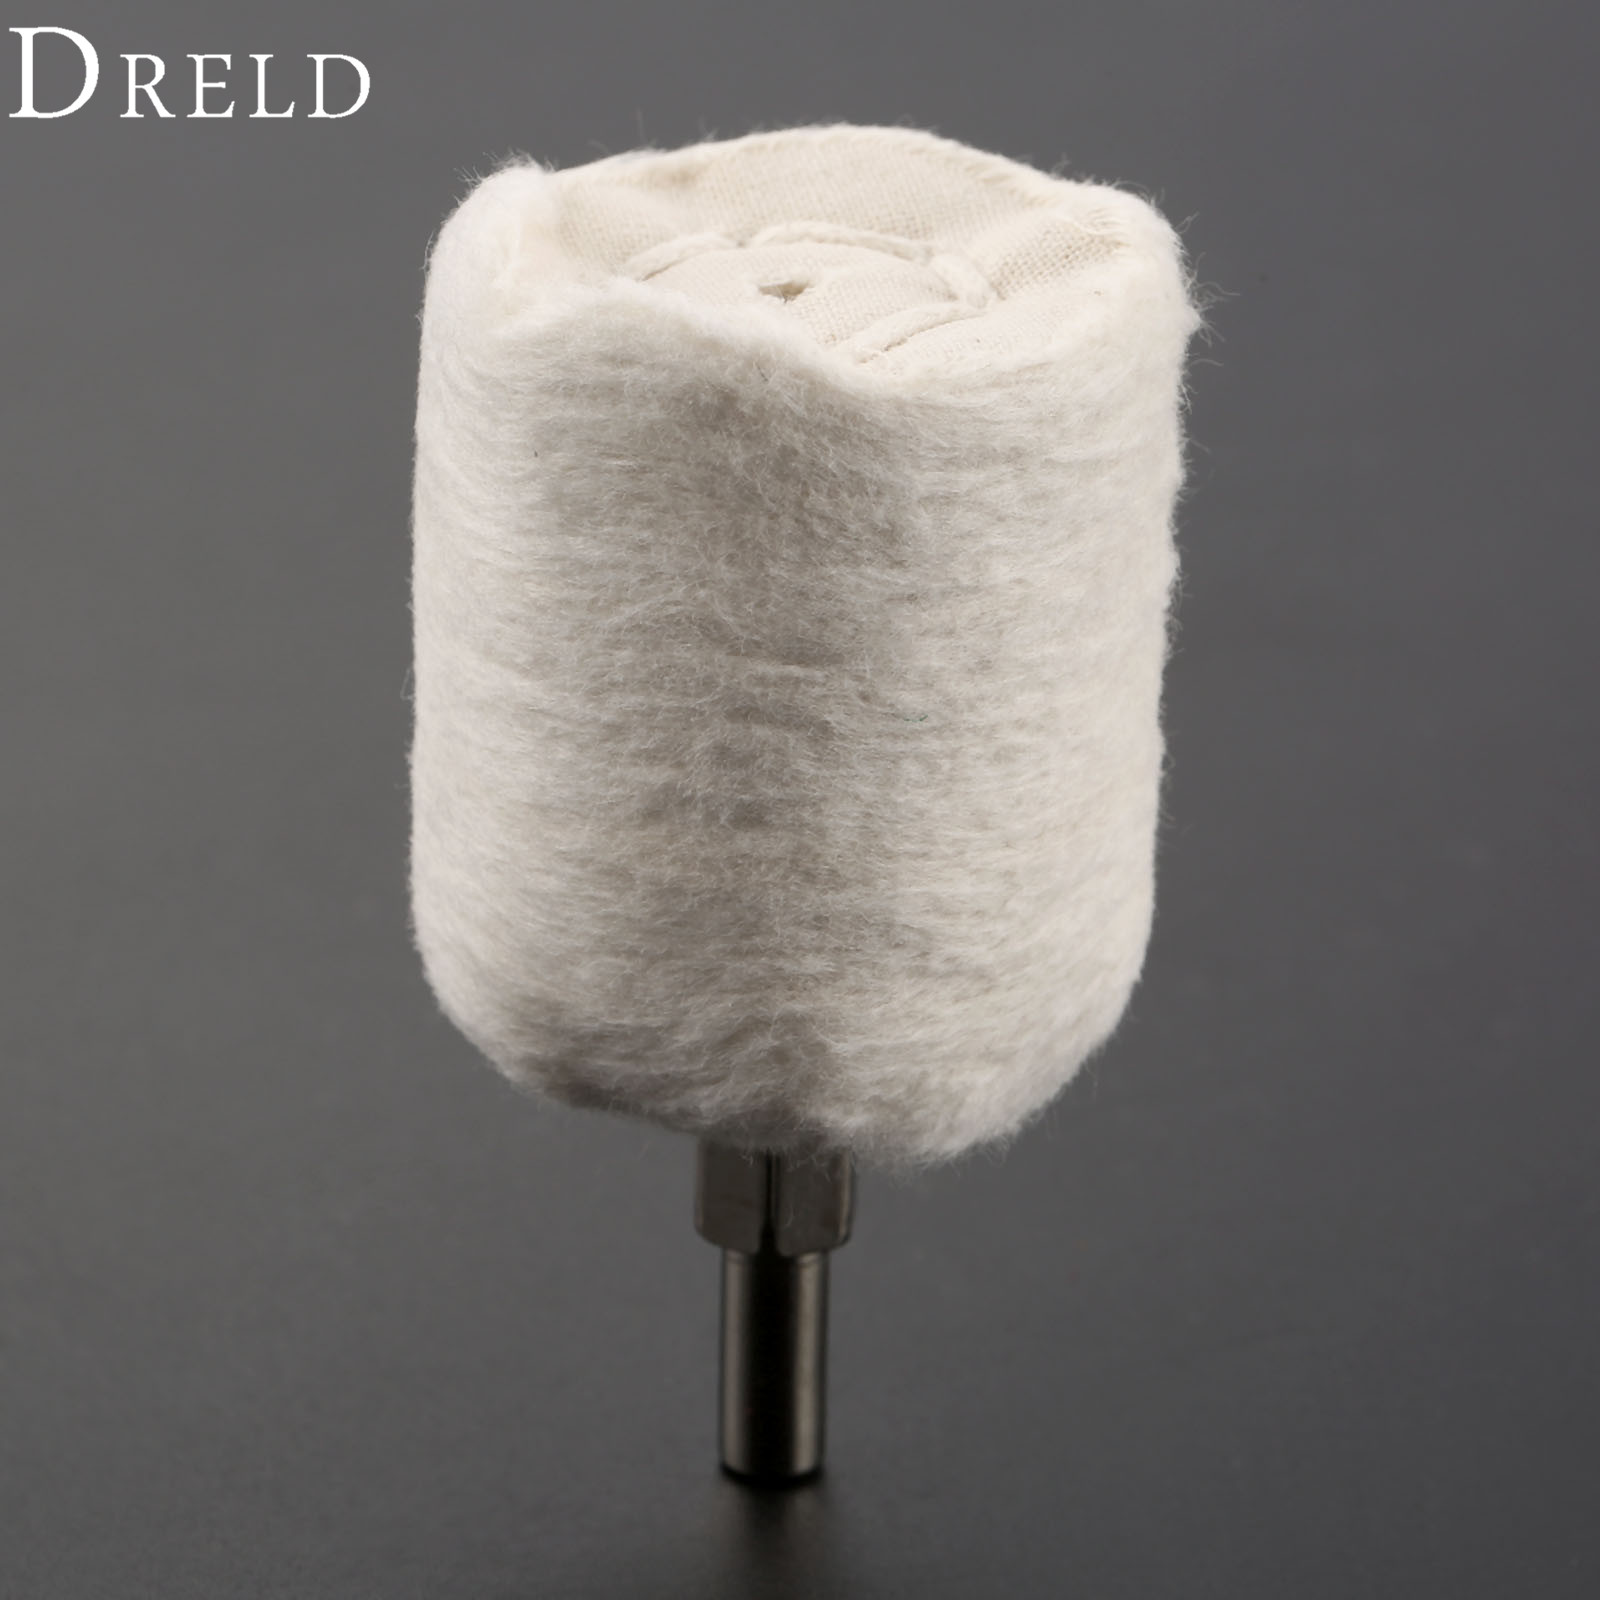 DRELD Dremel Accessories 40mm/1 5